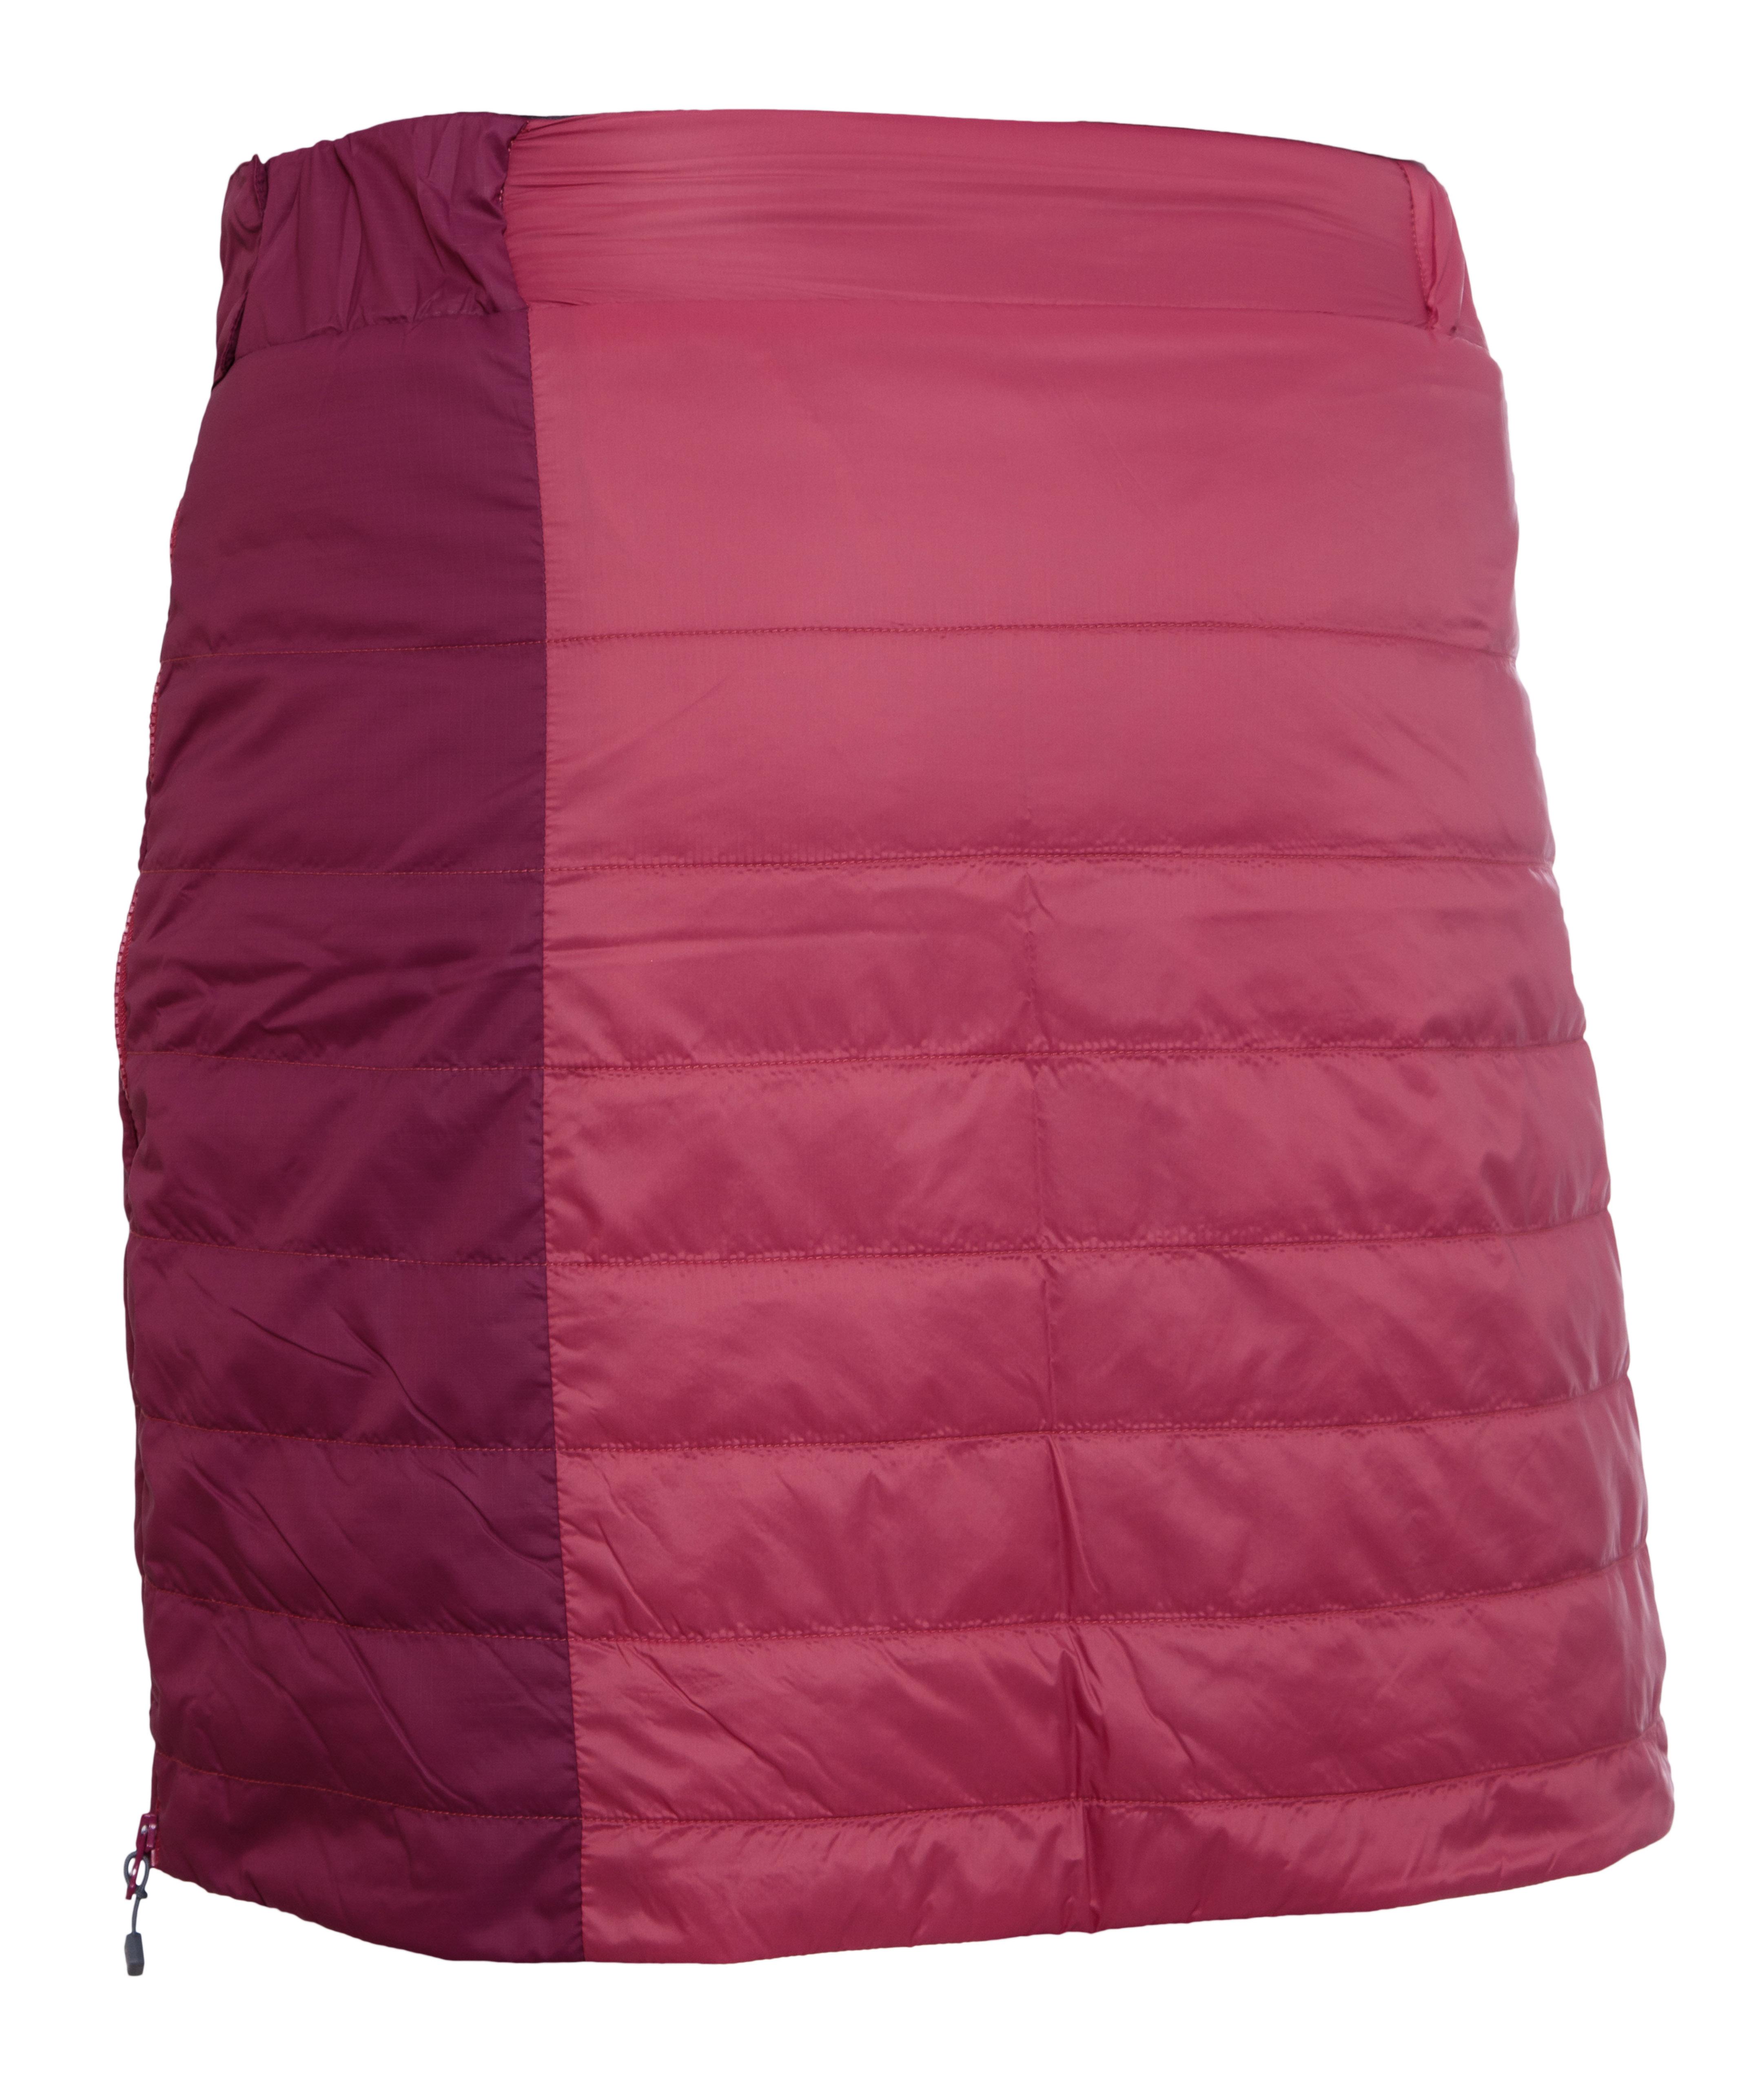 4407 Shee skirt berry-plum-iron back